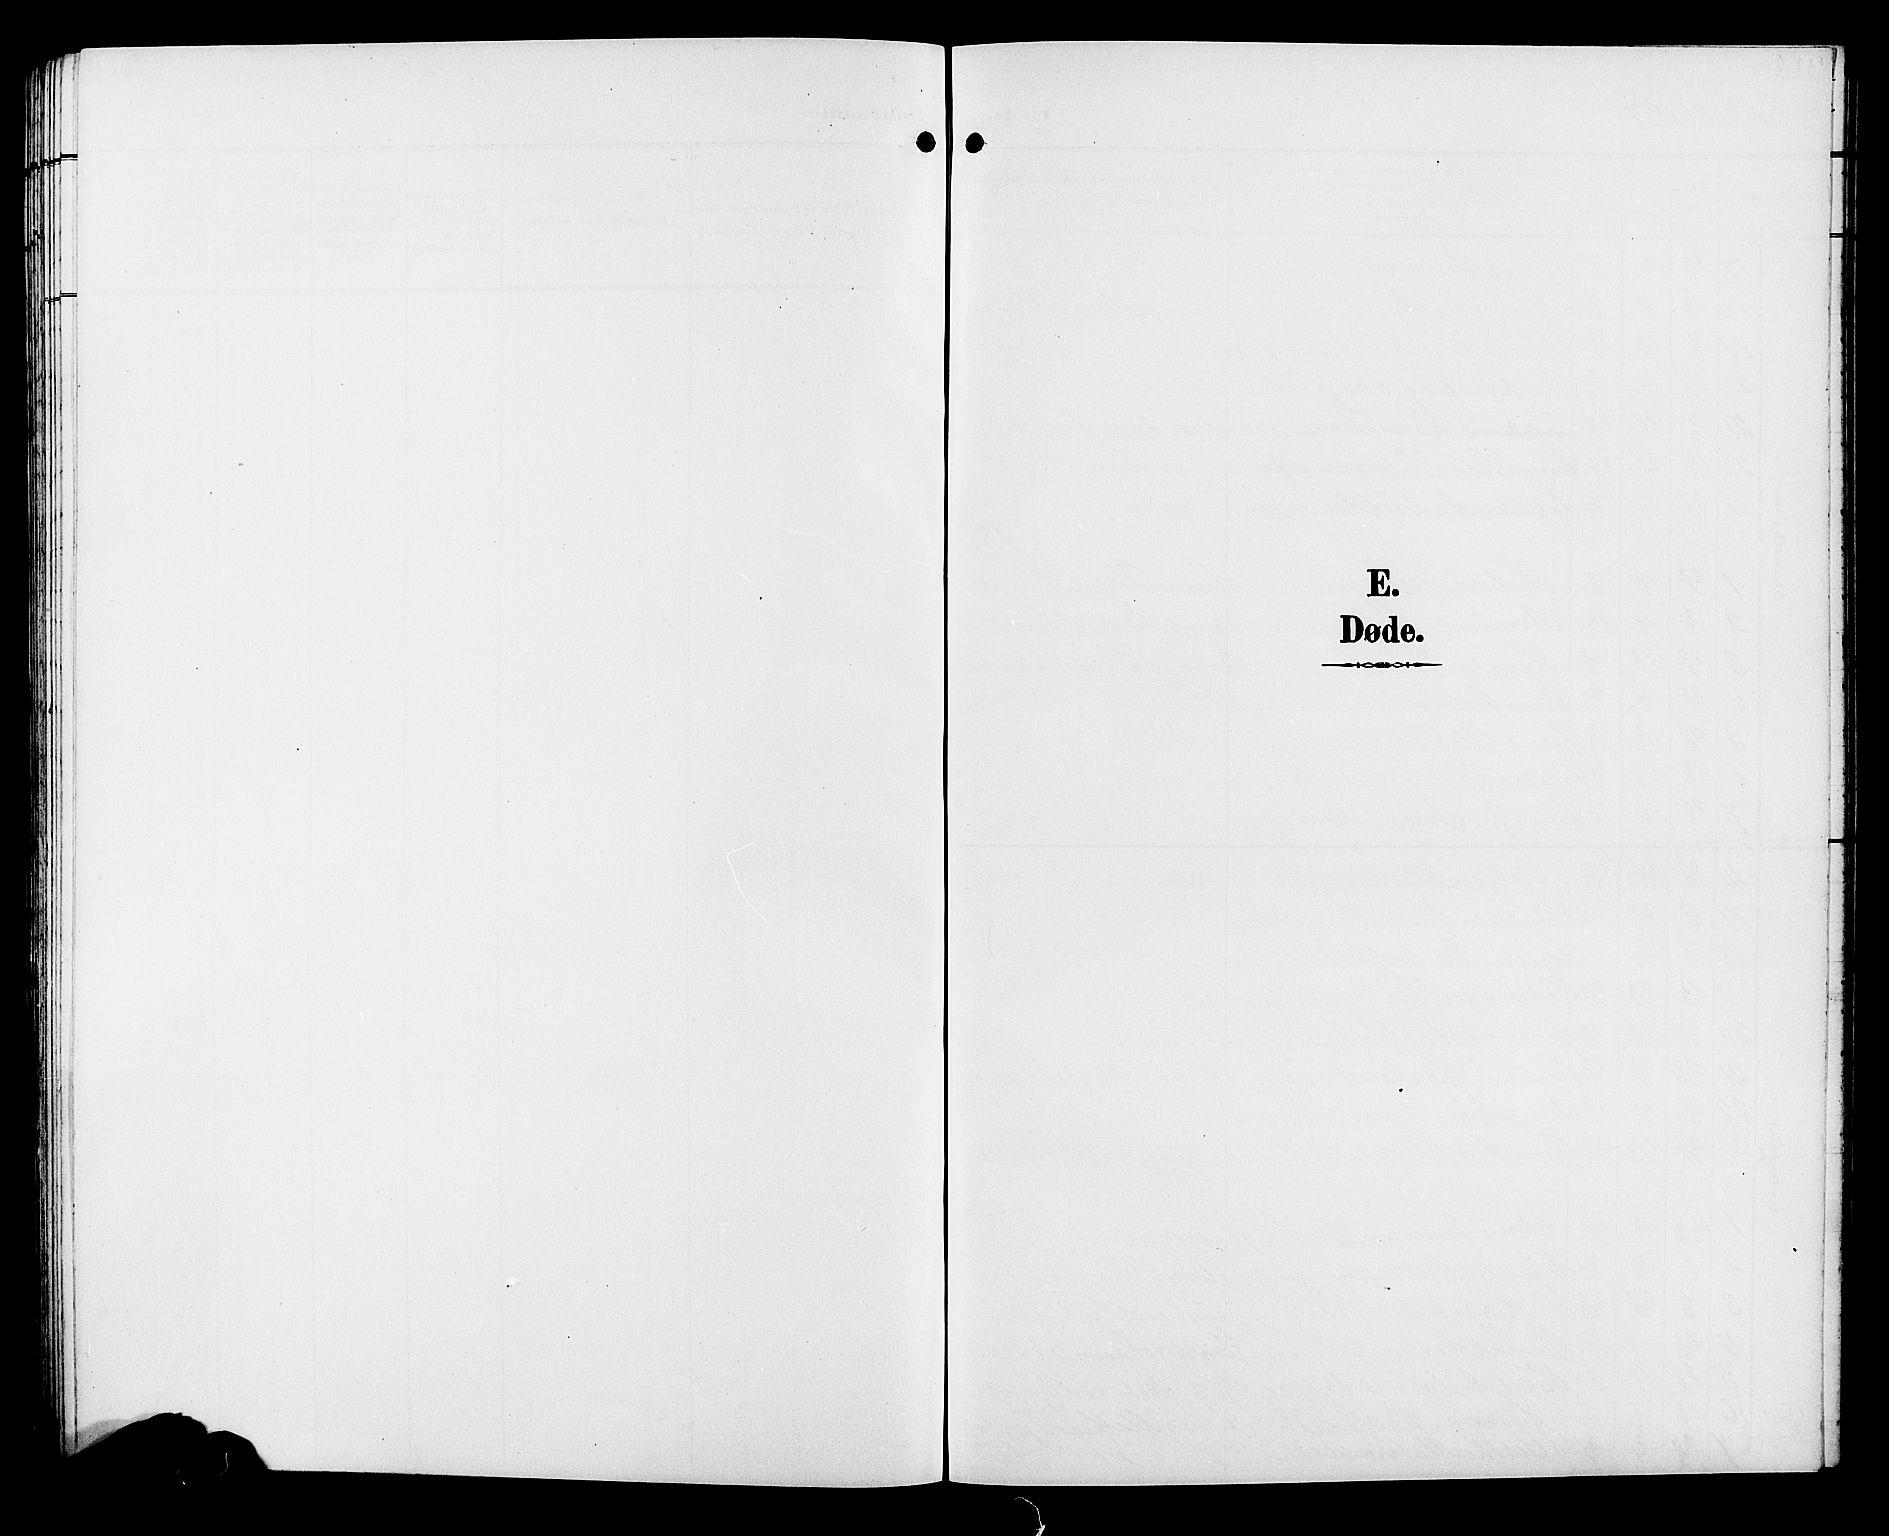 SAH, Sør-Fron prestekontor, H/Ha/Hab/L0004: Klokkerbok nr. 4, 1896-1911